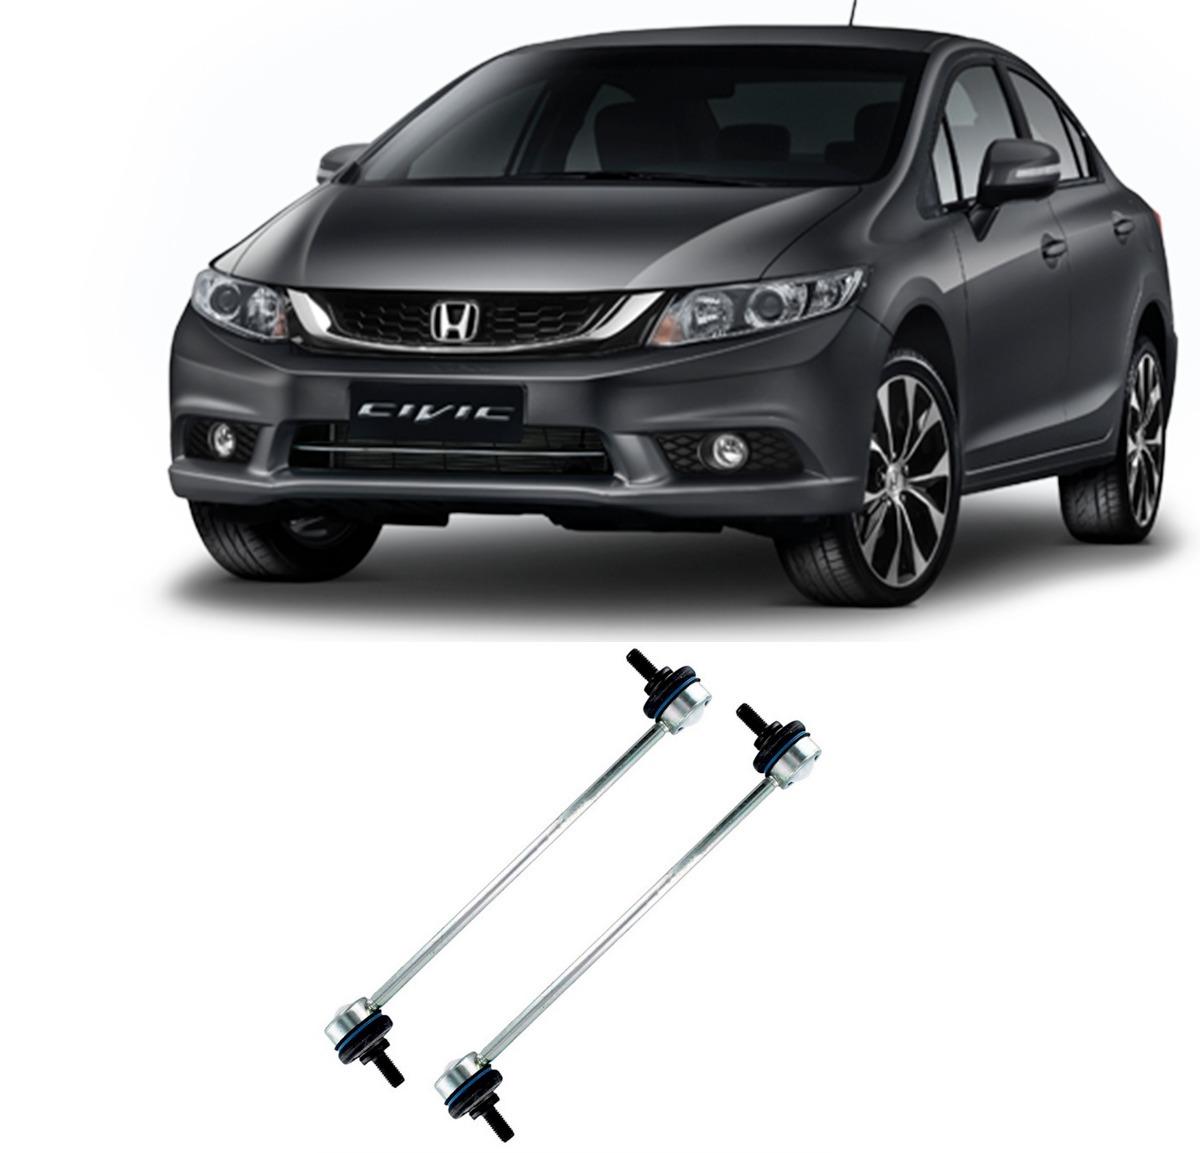 Nice Par Bieletas Cofap Honda Civic 1.8 16v Exs Lxl Lxs 2013. Carregando Zoom.